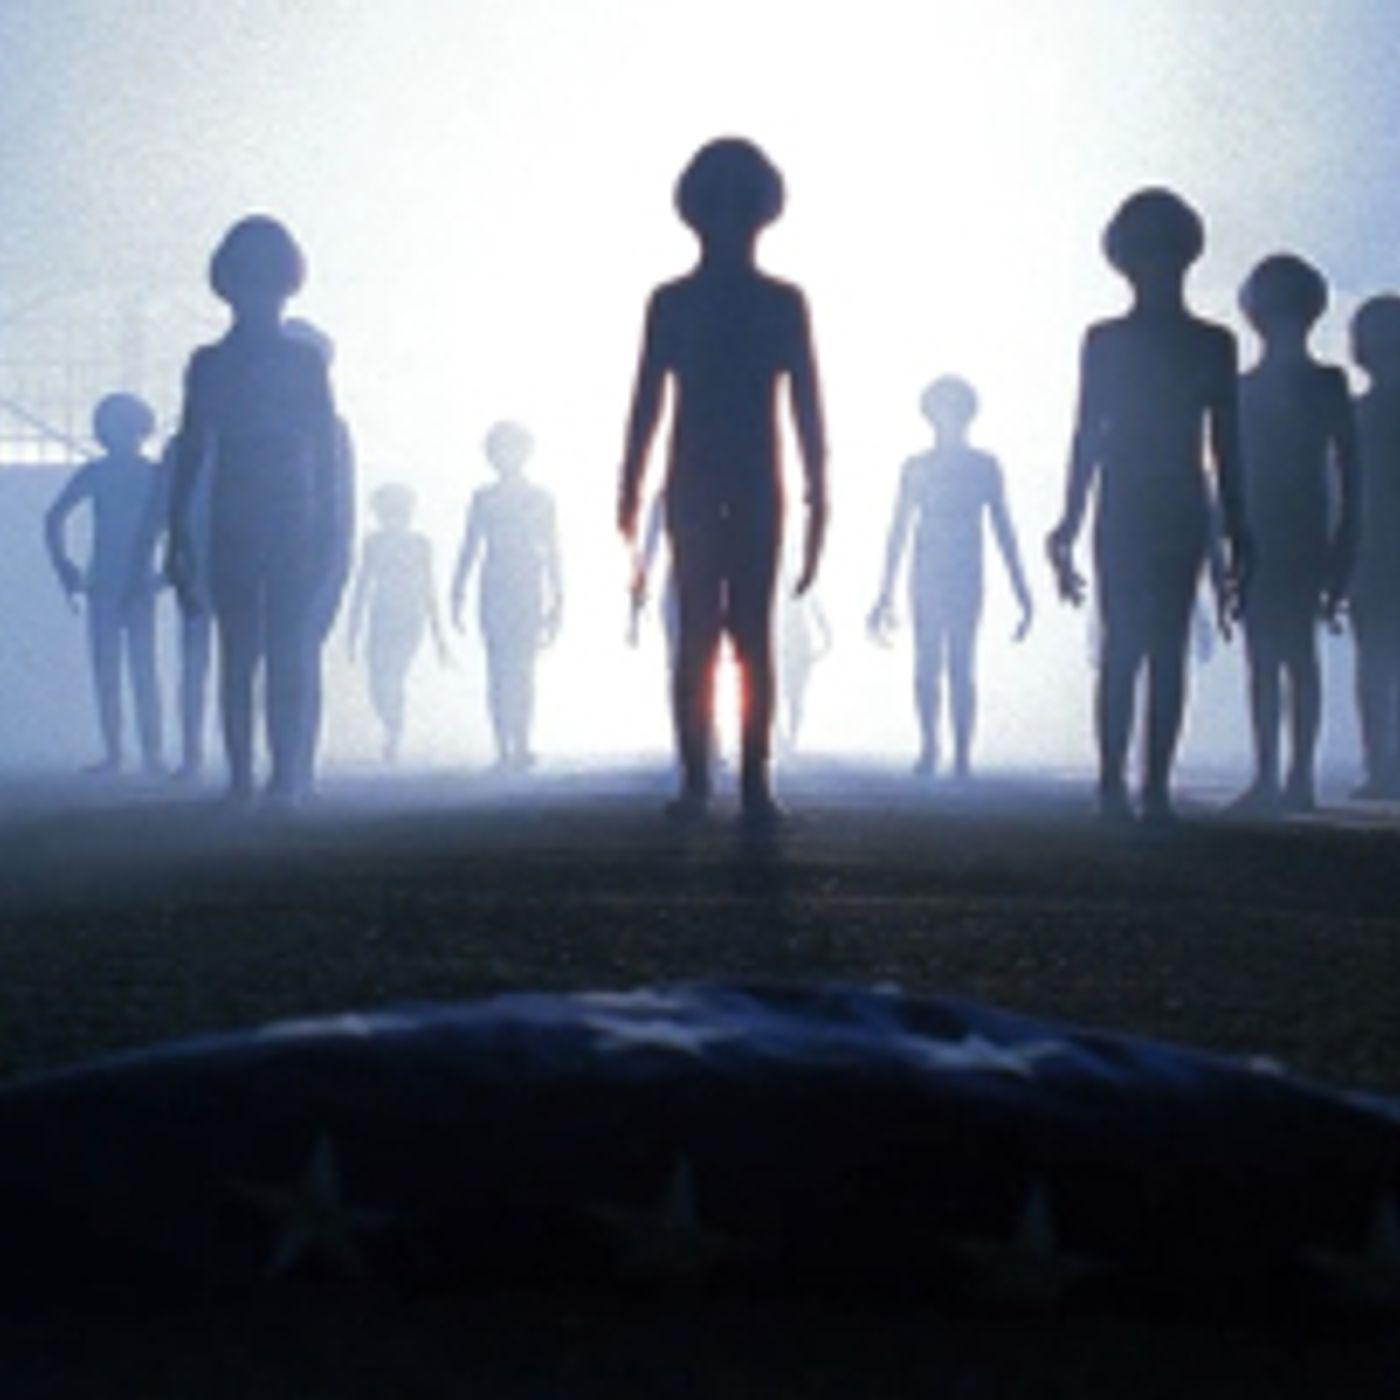 281. X-Files Top 10: The Mythology